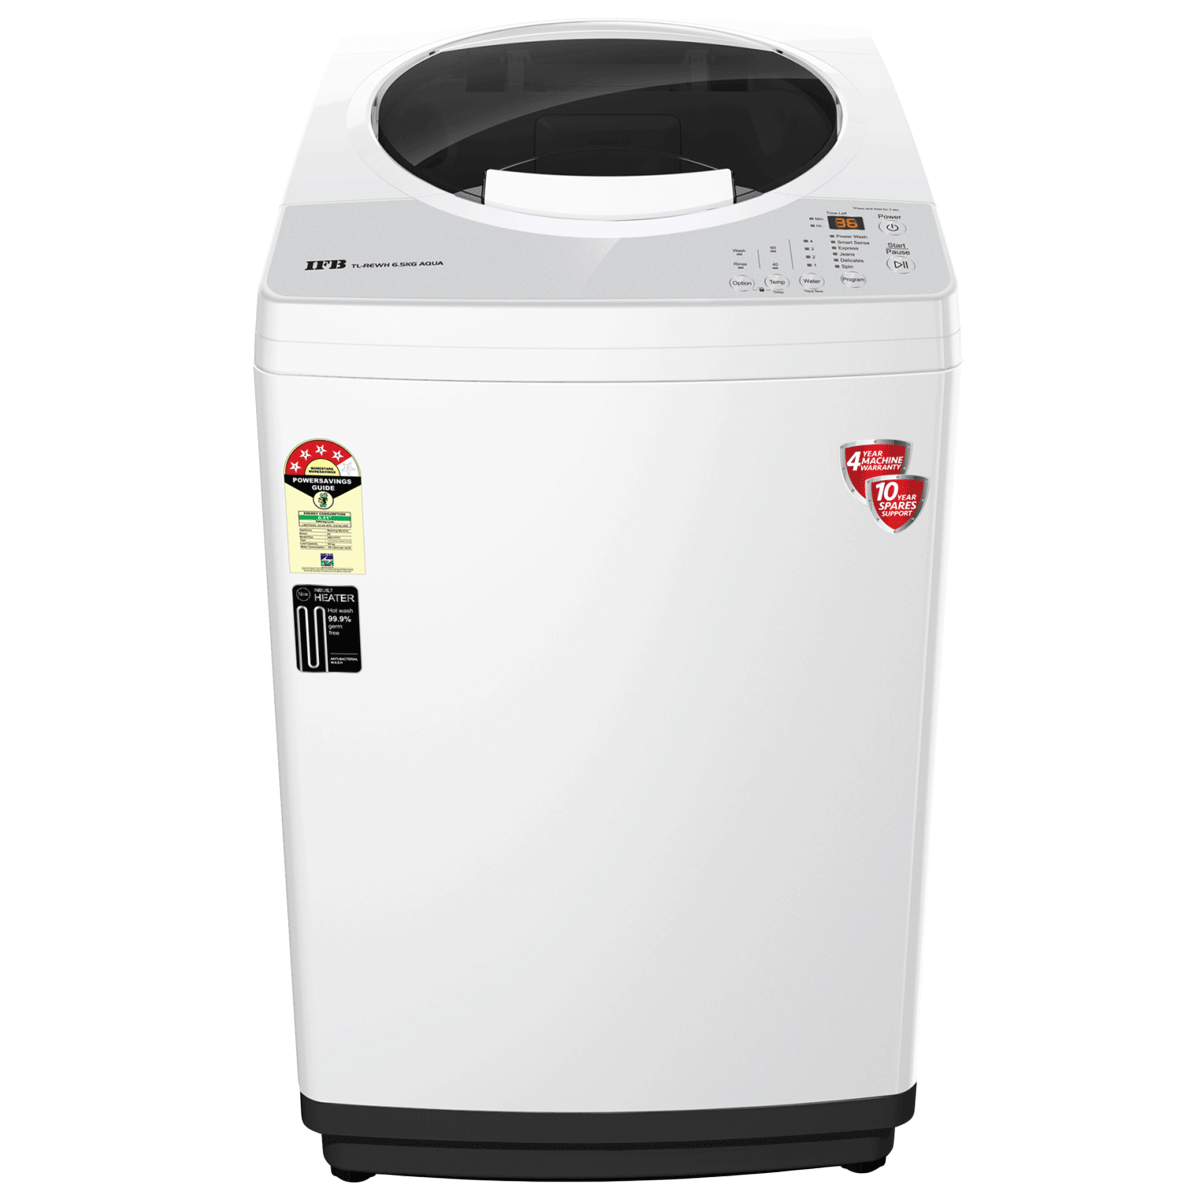 IFB Aqua 6.5 kg 5 Star Fully Automatic Top Load Washing Machine (Smart Weight Sensor, Inbuilt Heater, TL-REWH, PCM - White)_1